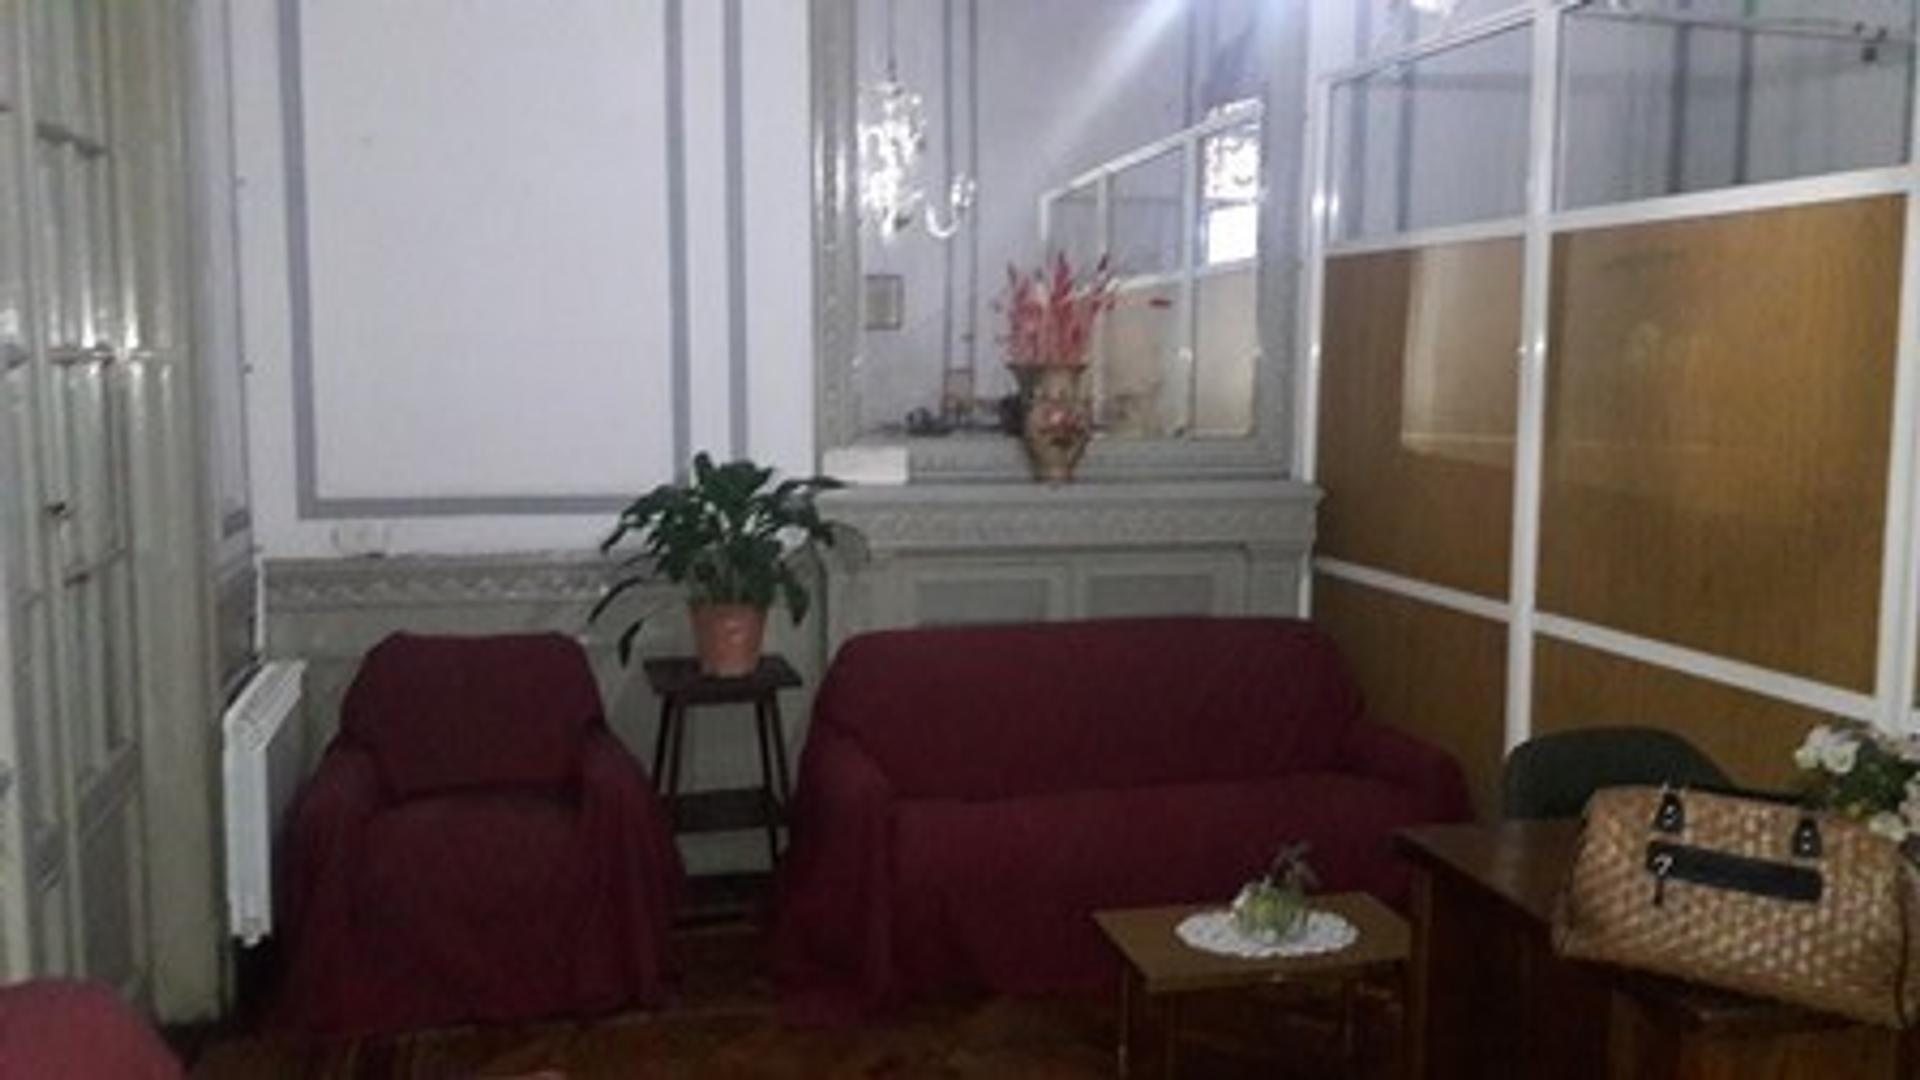 Departamento - Venta - Argentina, Capital Federal - AVENIDA BELGRANO 1400